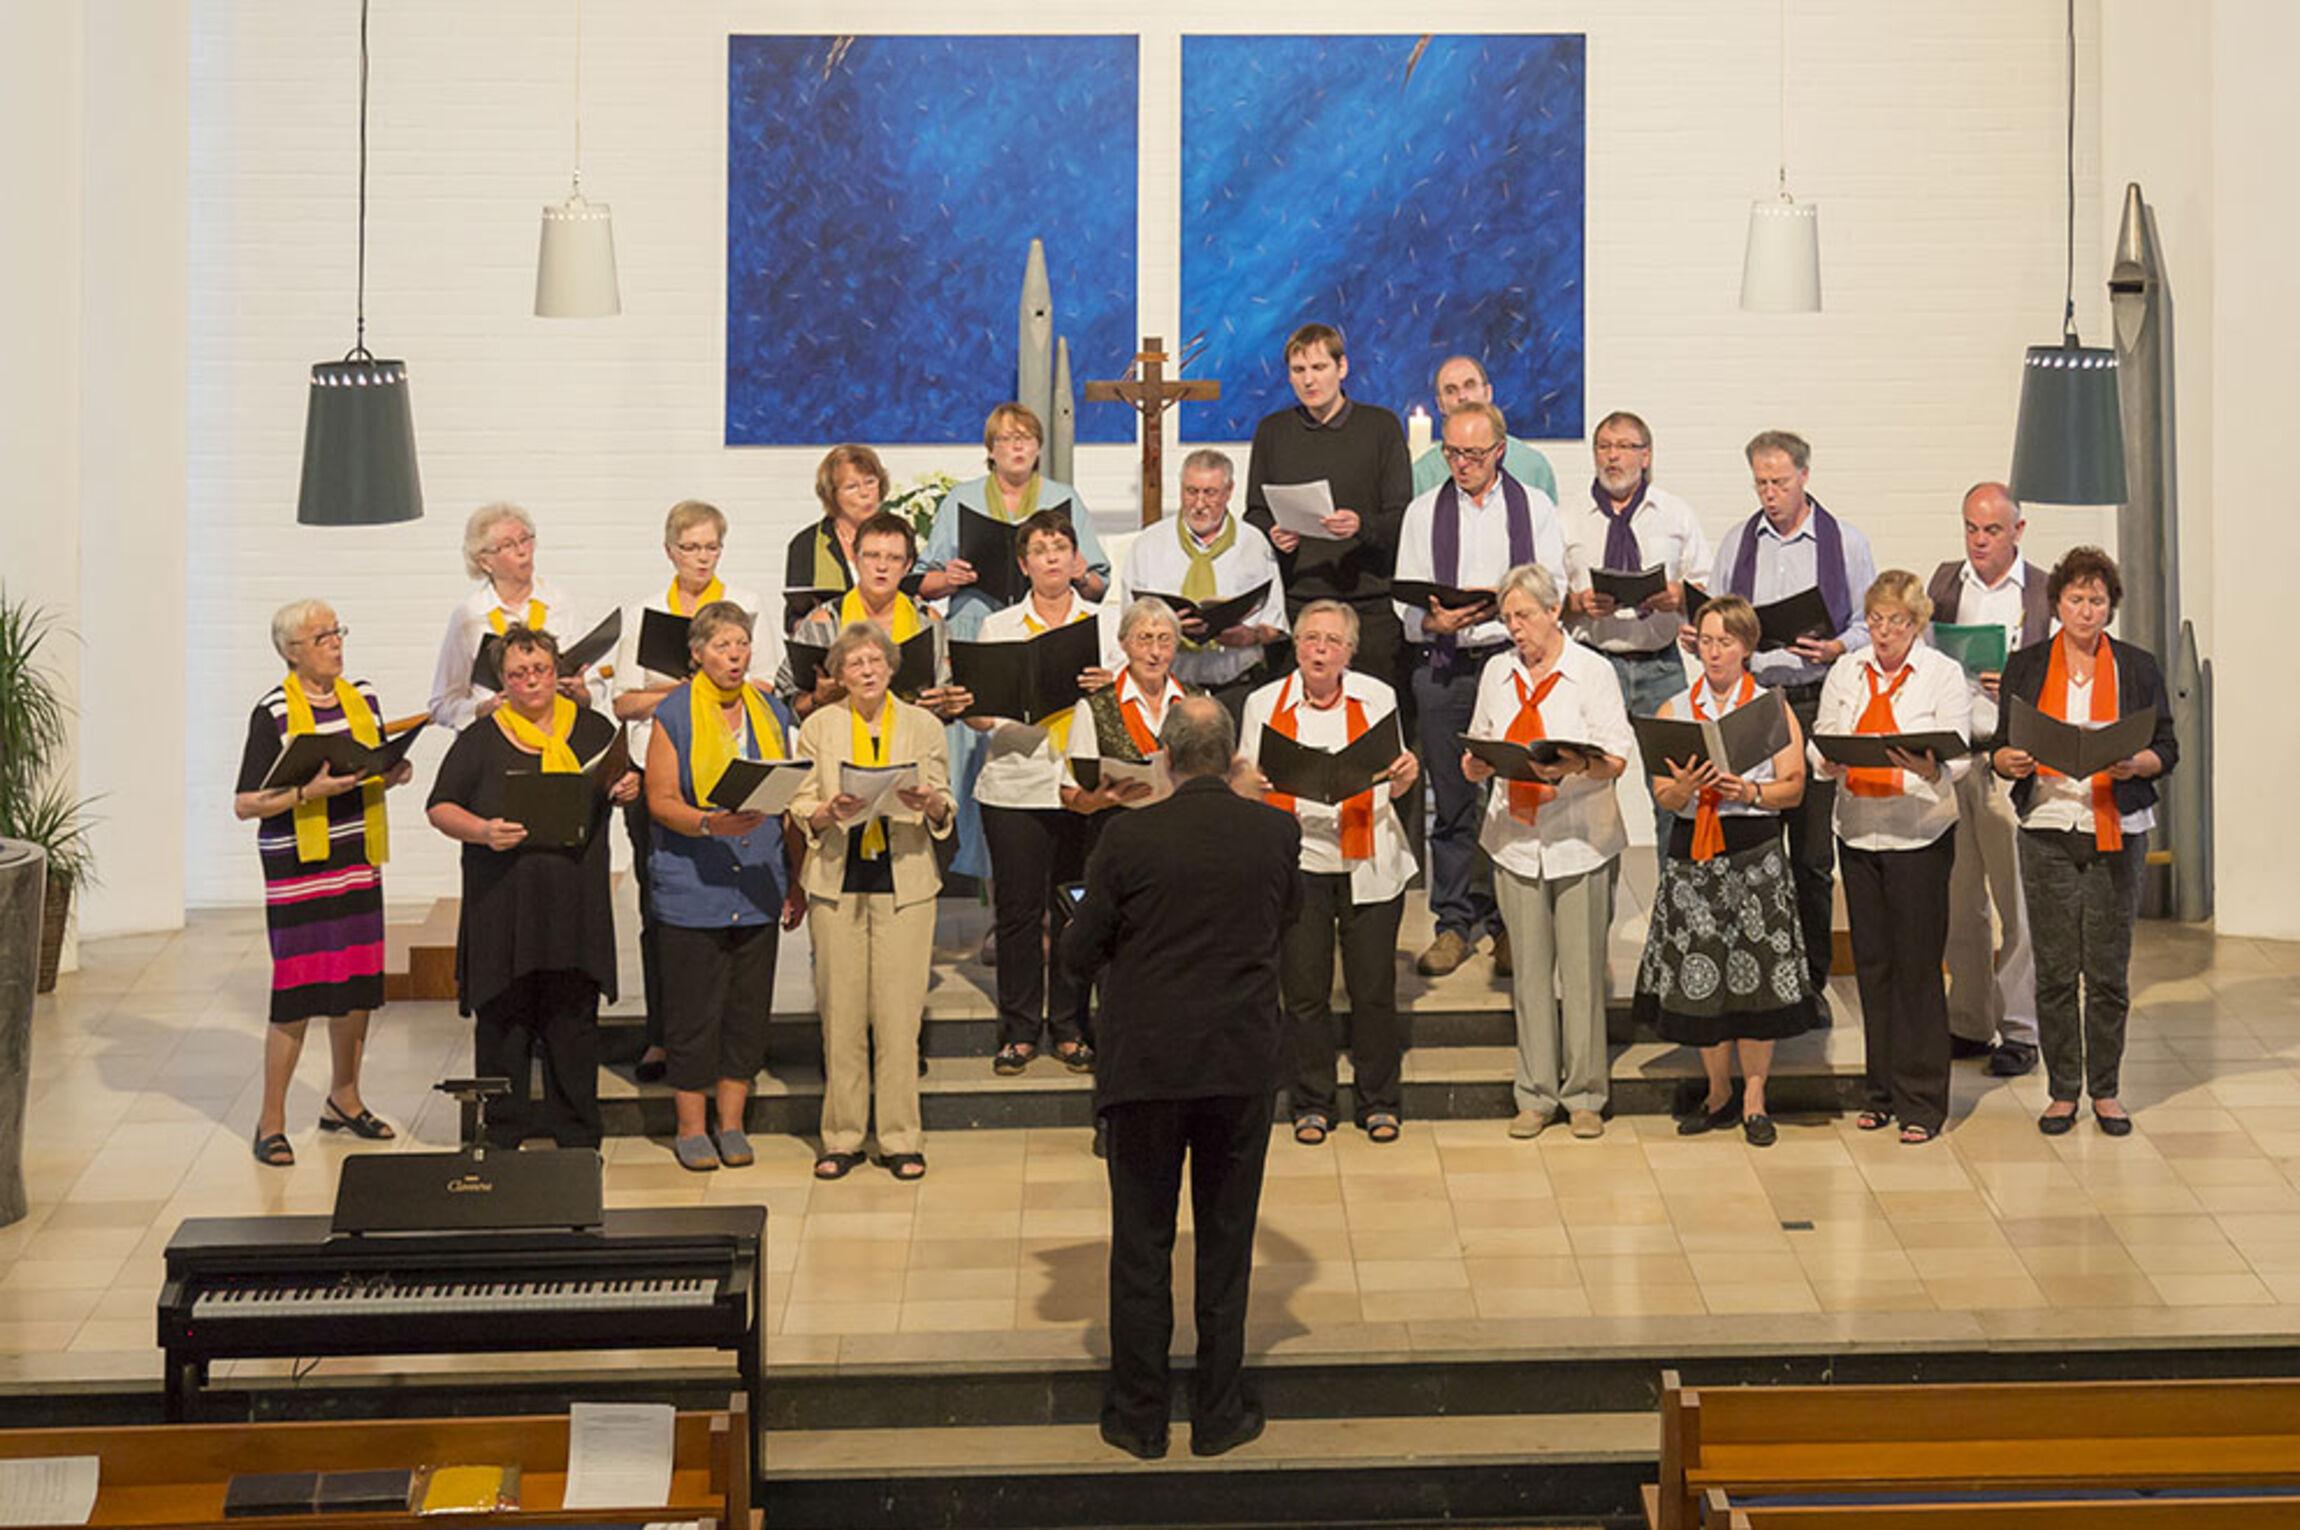 orgeljubilaeum 05-09-2013_008-ko-web